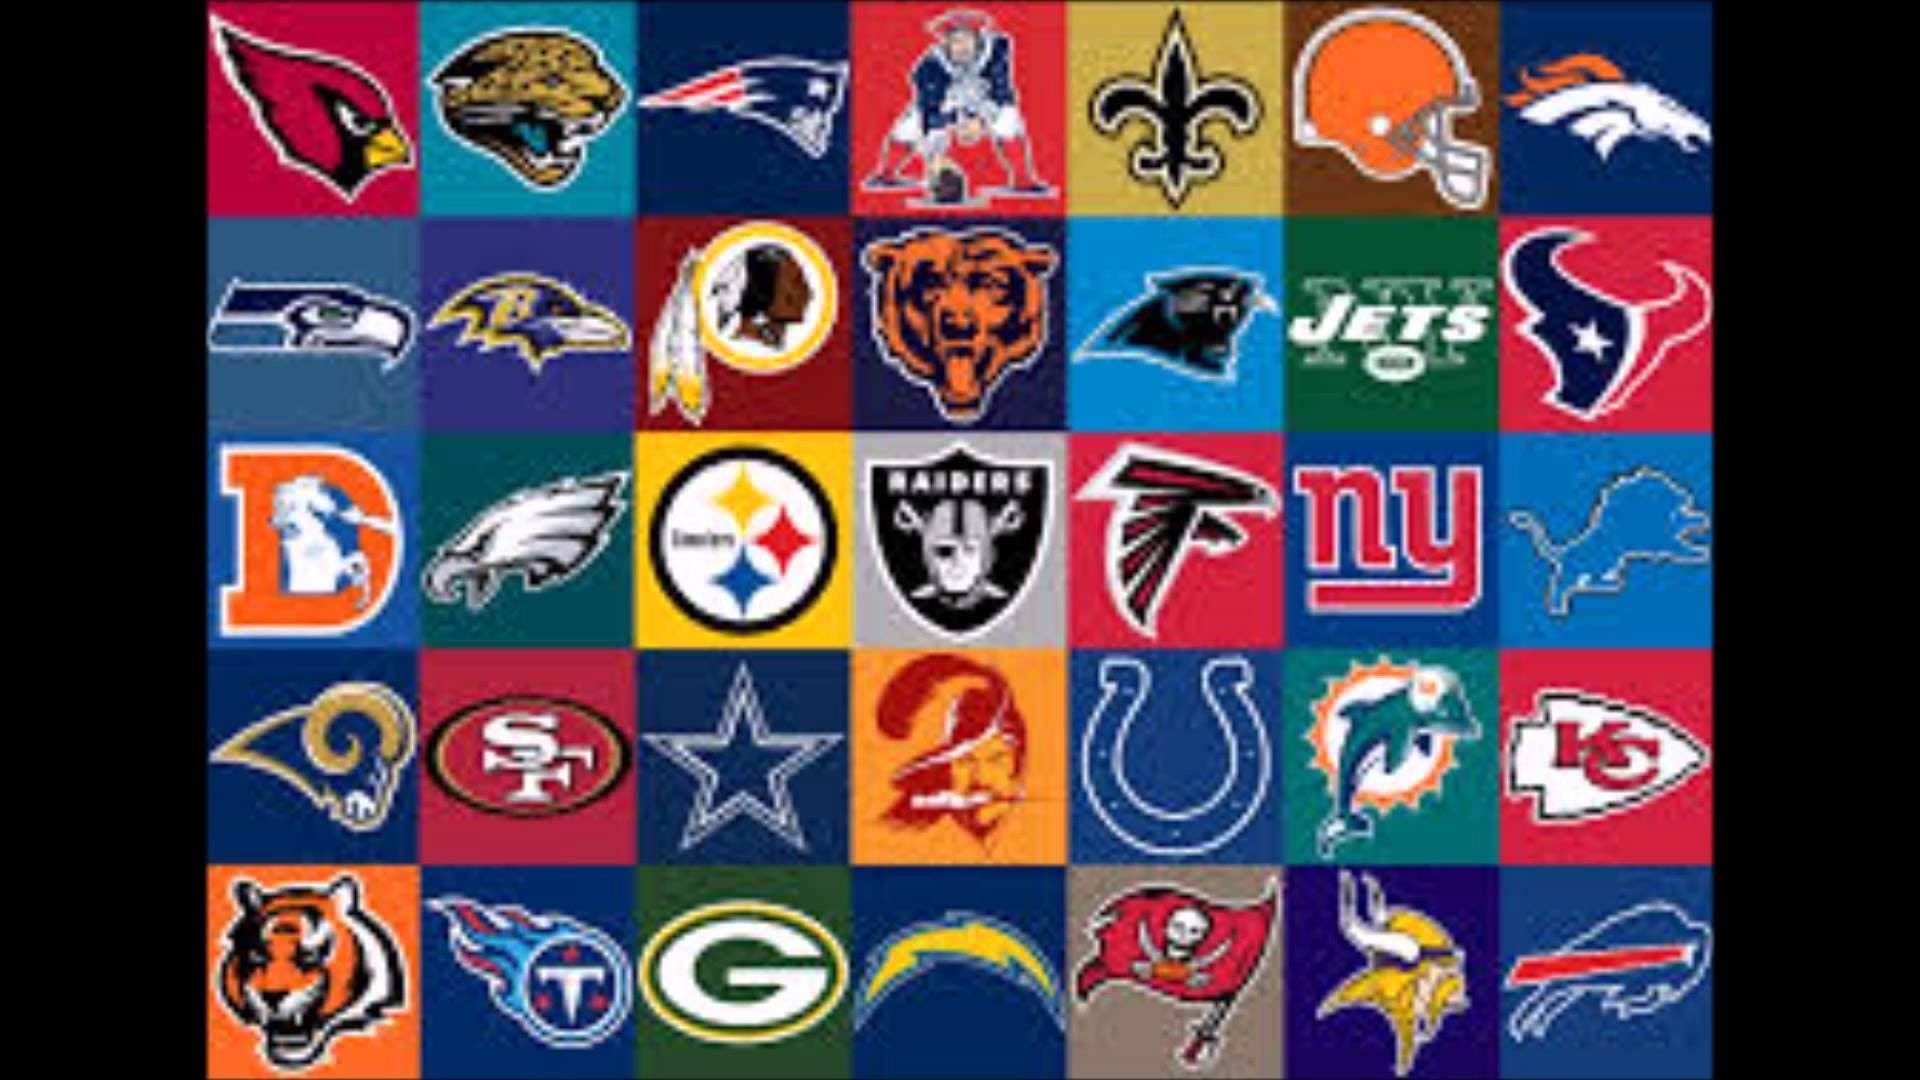 NFL Team Logos Wallpaper (52+ images)